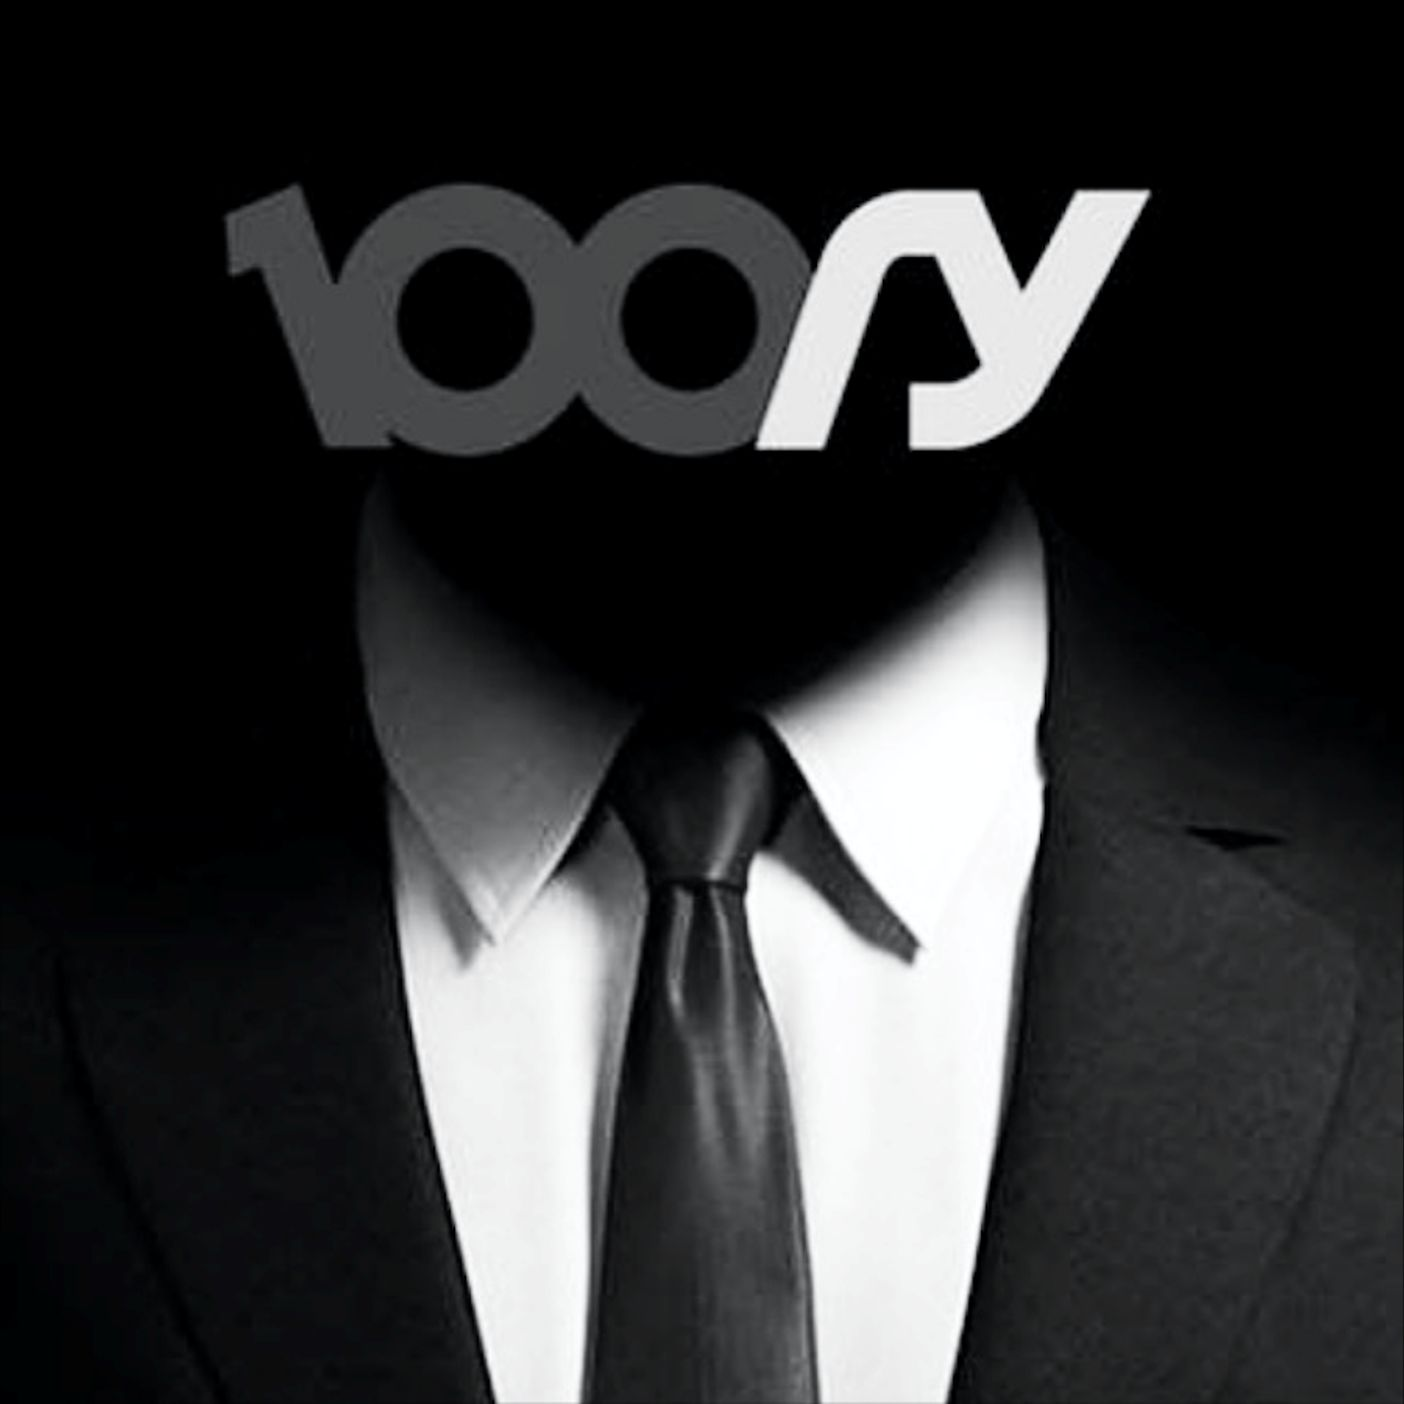 100RY